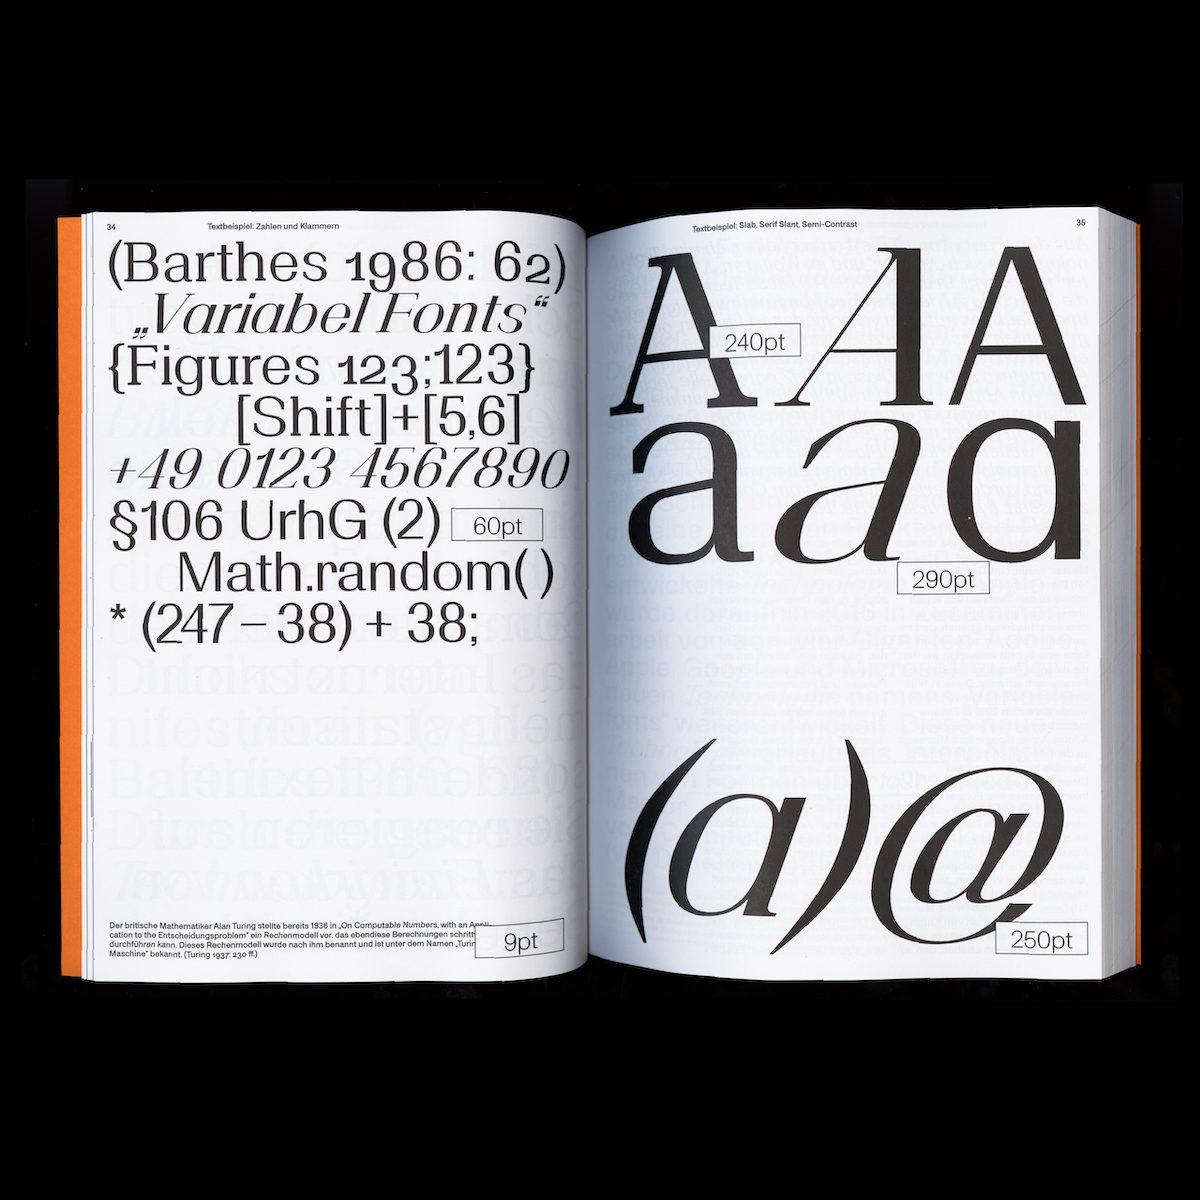 Speculative type book